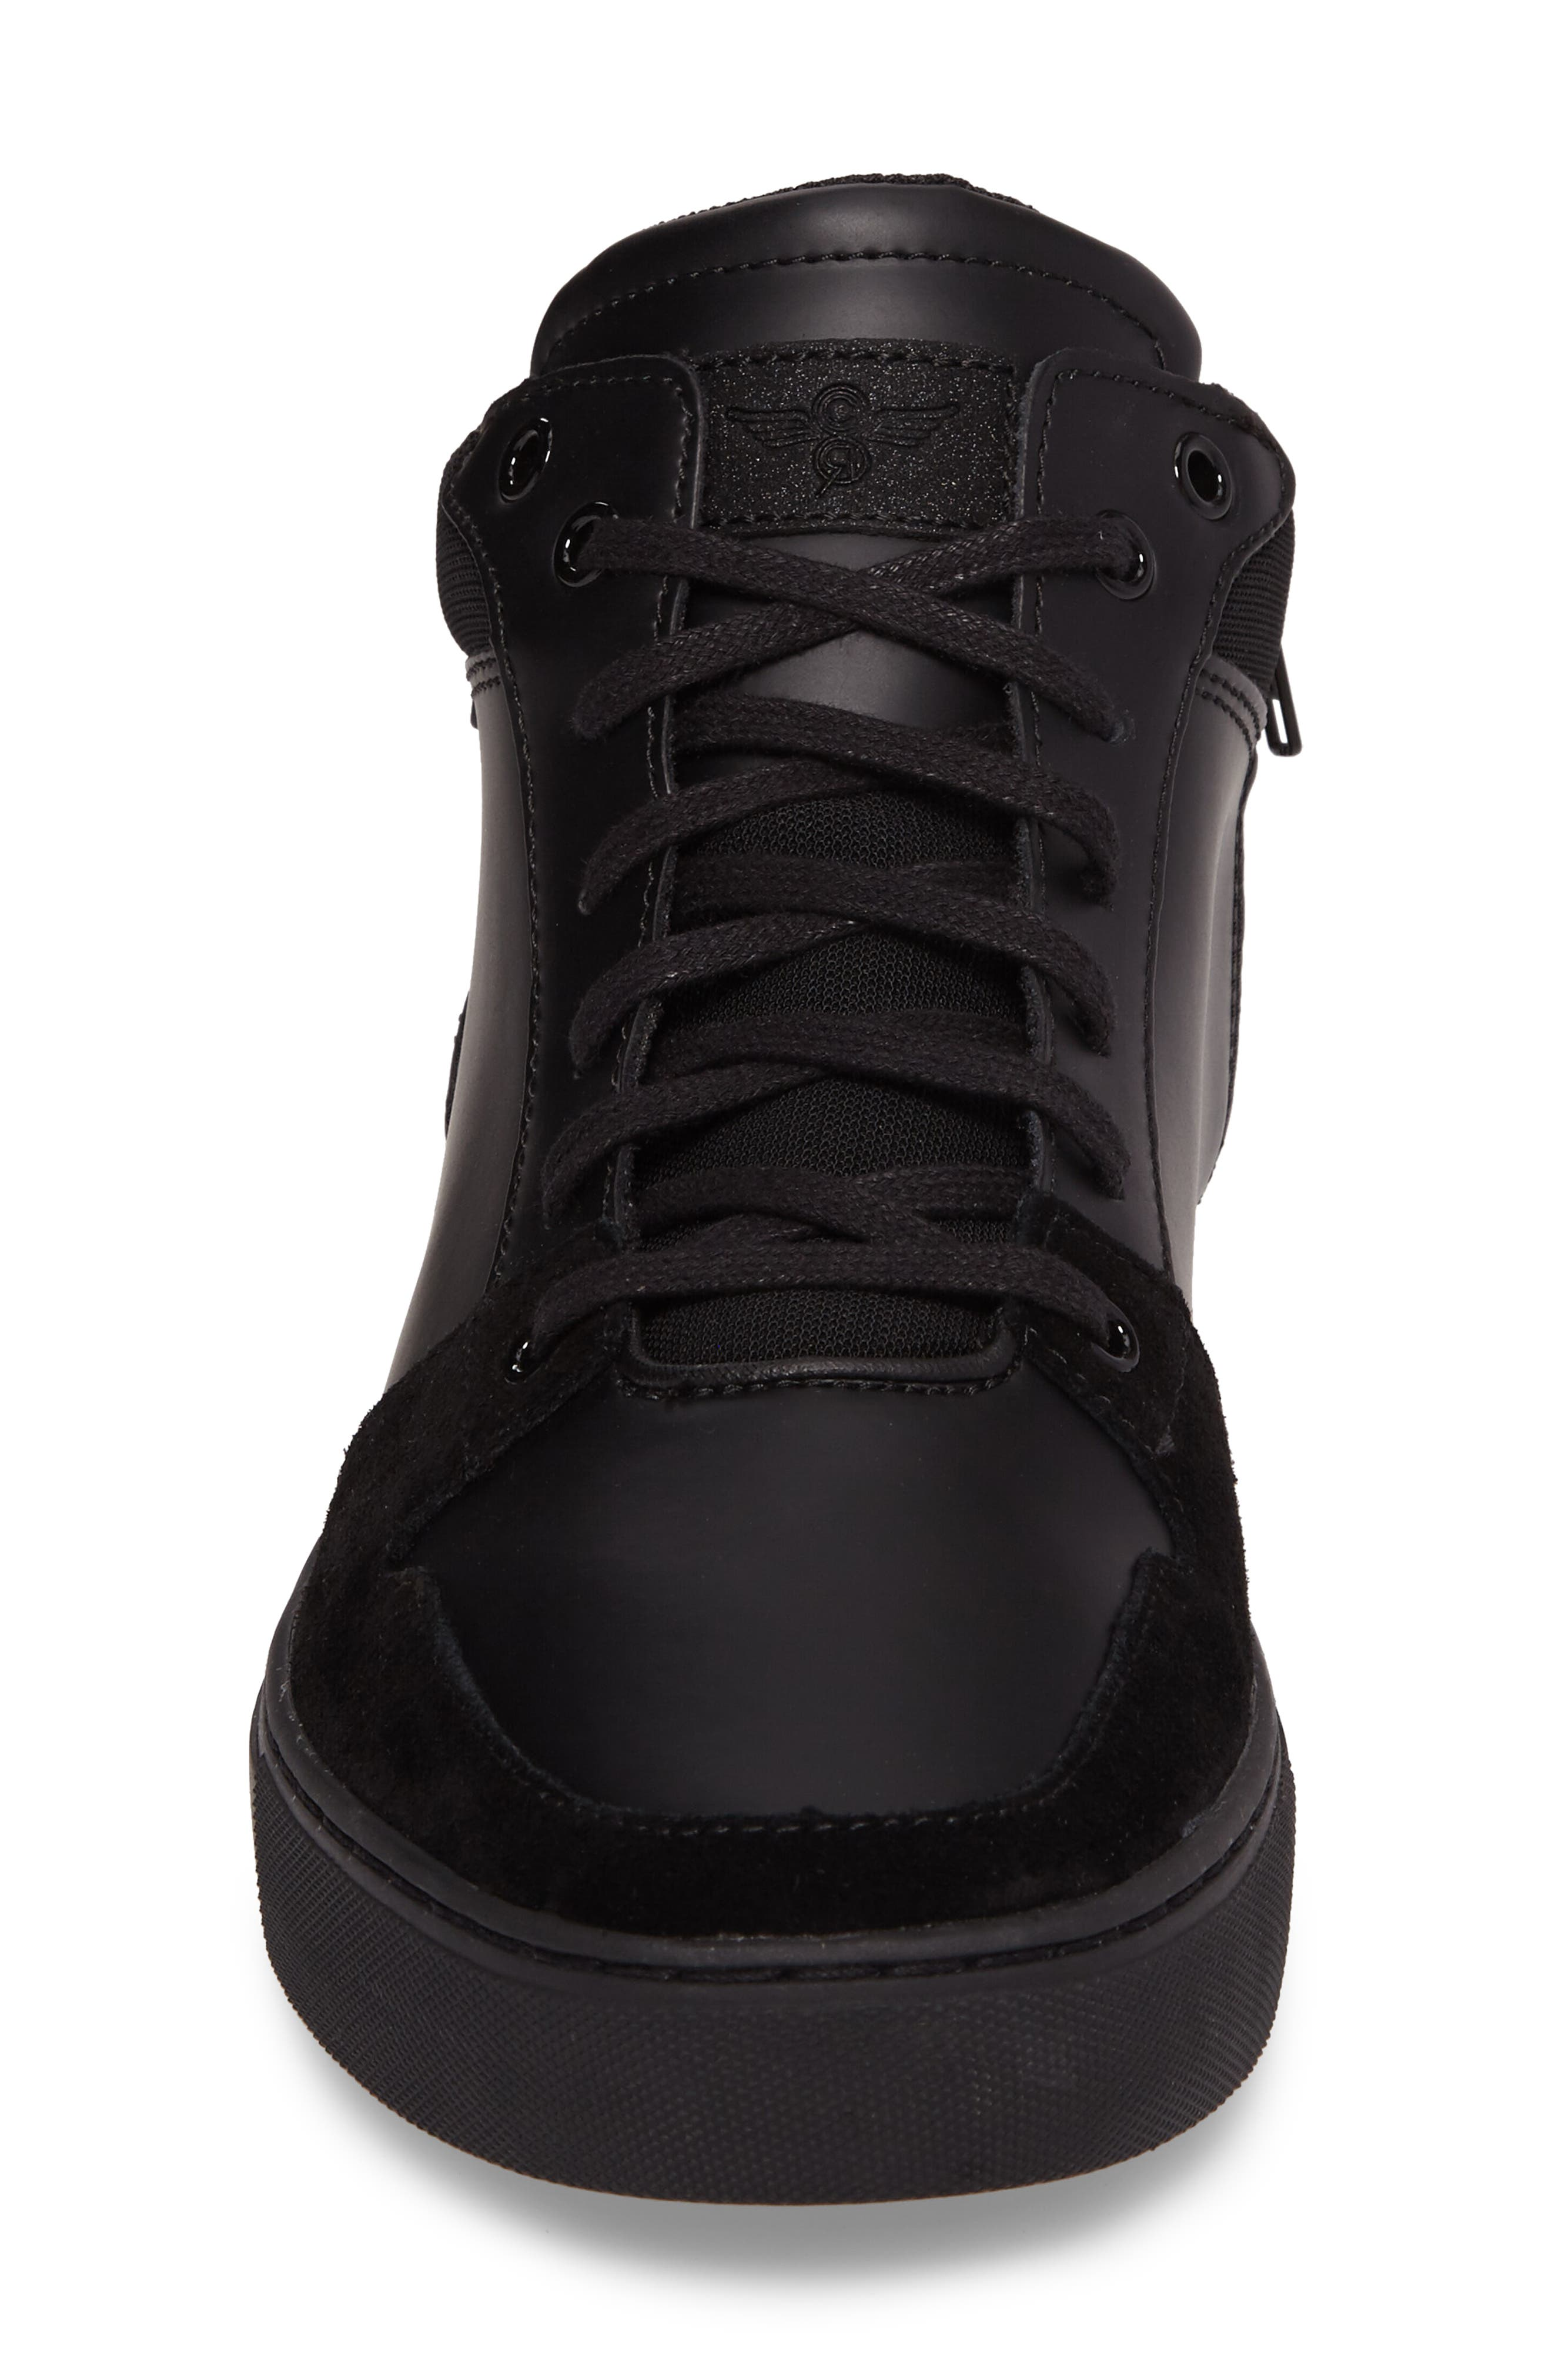 Modena Sneaker,                             Alternate thumbnail 4, color,                             Black Tech